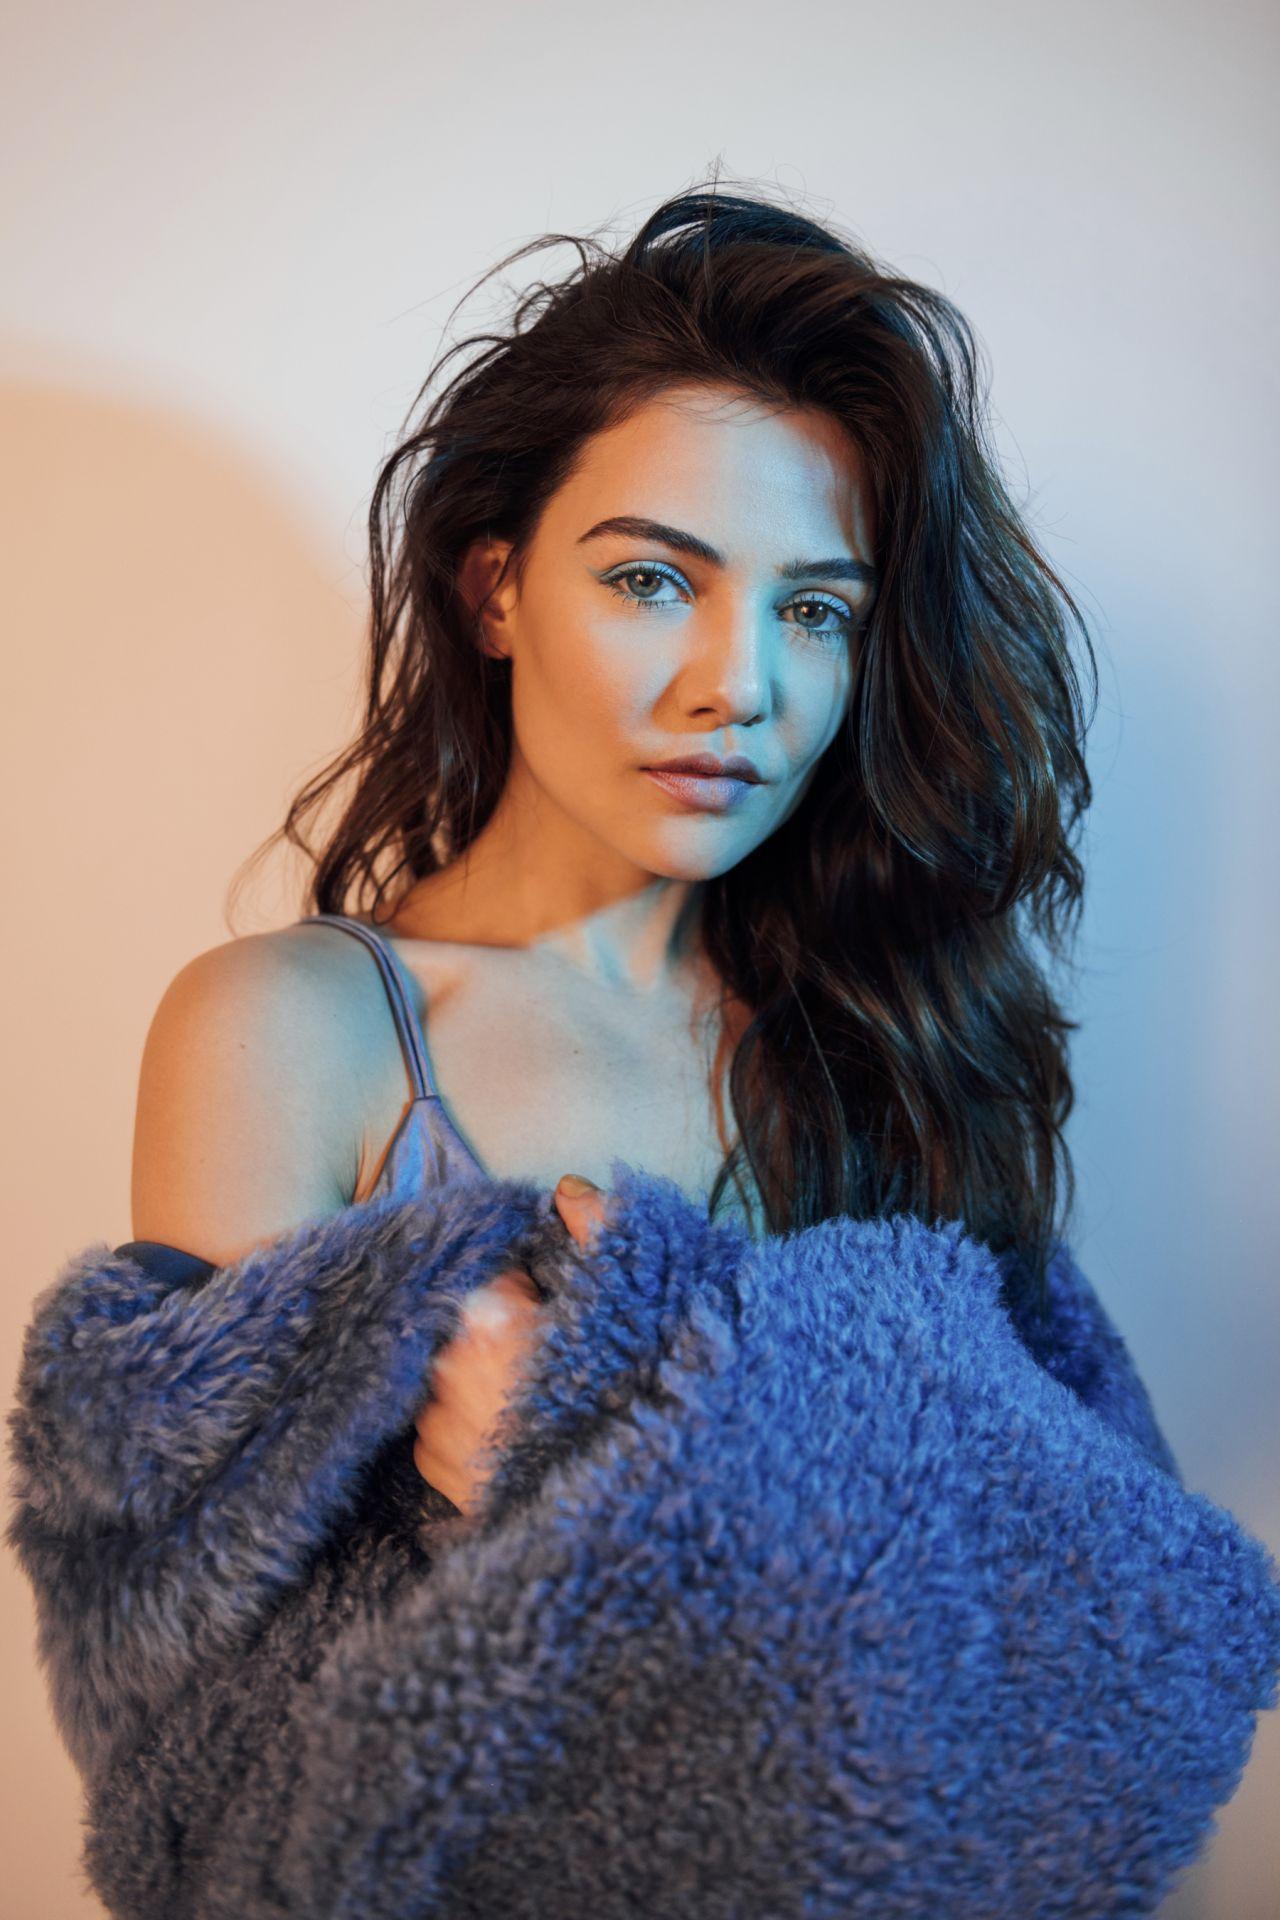 Danielle Campbell Pulse Spikes Photoshoot January 2019